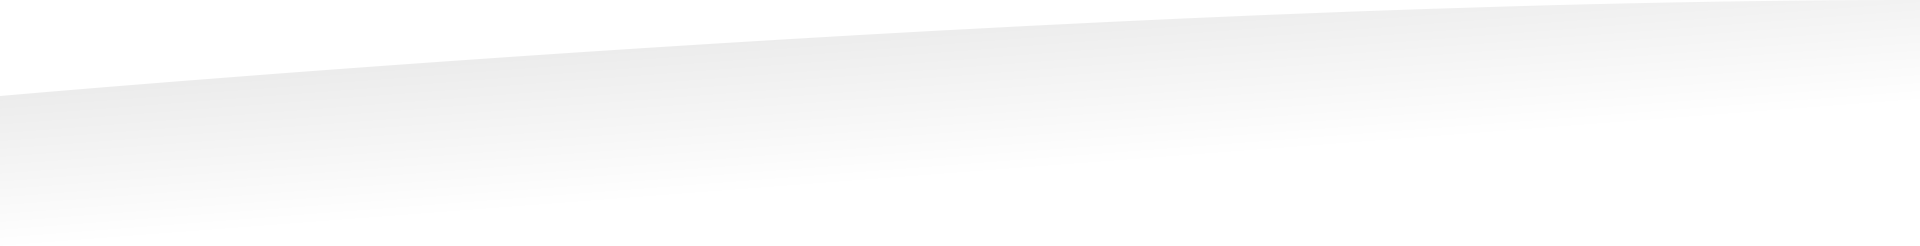 Carrosserie Igon, Carrosserie Nay, Carrosserie plaine de Nay, Garage automobile Igon, Garage automobile Nay, Garage automobile plaine de Nay, Location véhicule Igon, Location véhicule Nay, Location véhicule plaine de Nay, Mécanique auto Igon, Mécanique auto Nay, Mécanique auto plaine de Nay, Pare brise Igon, Pare brise Nay, Pare brise plaine de Nay